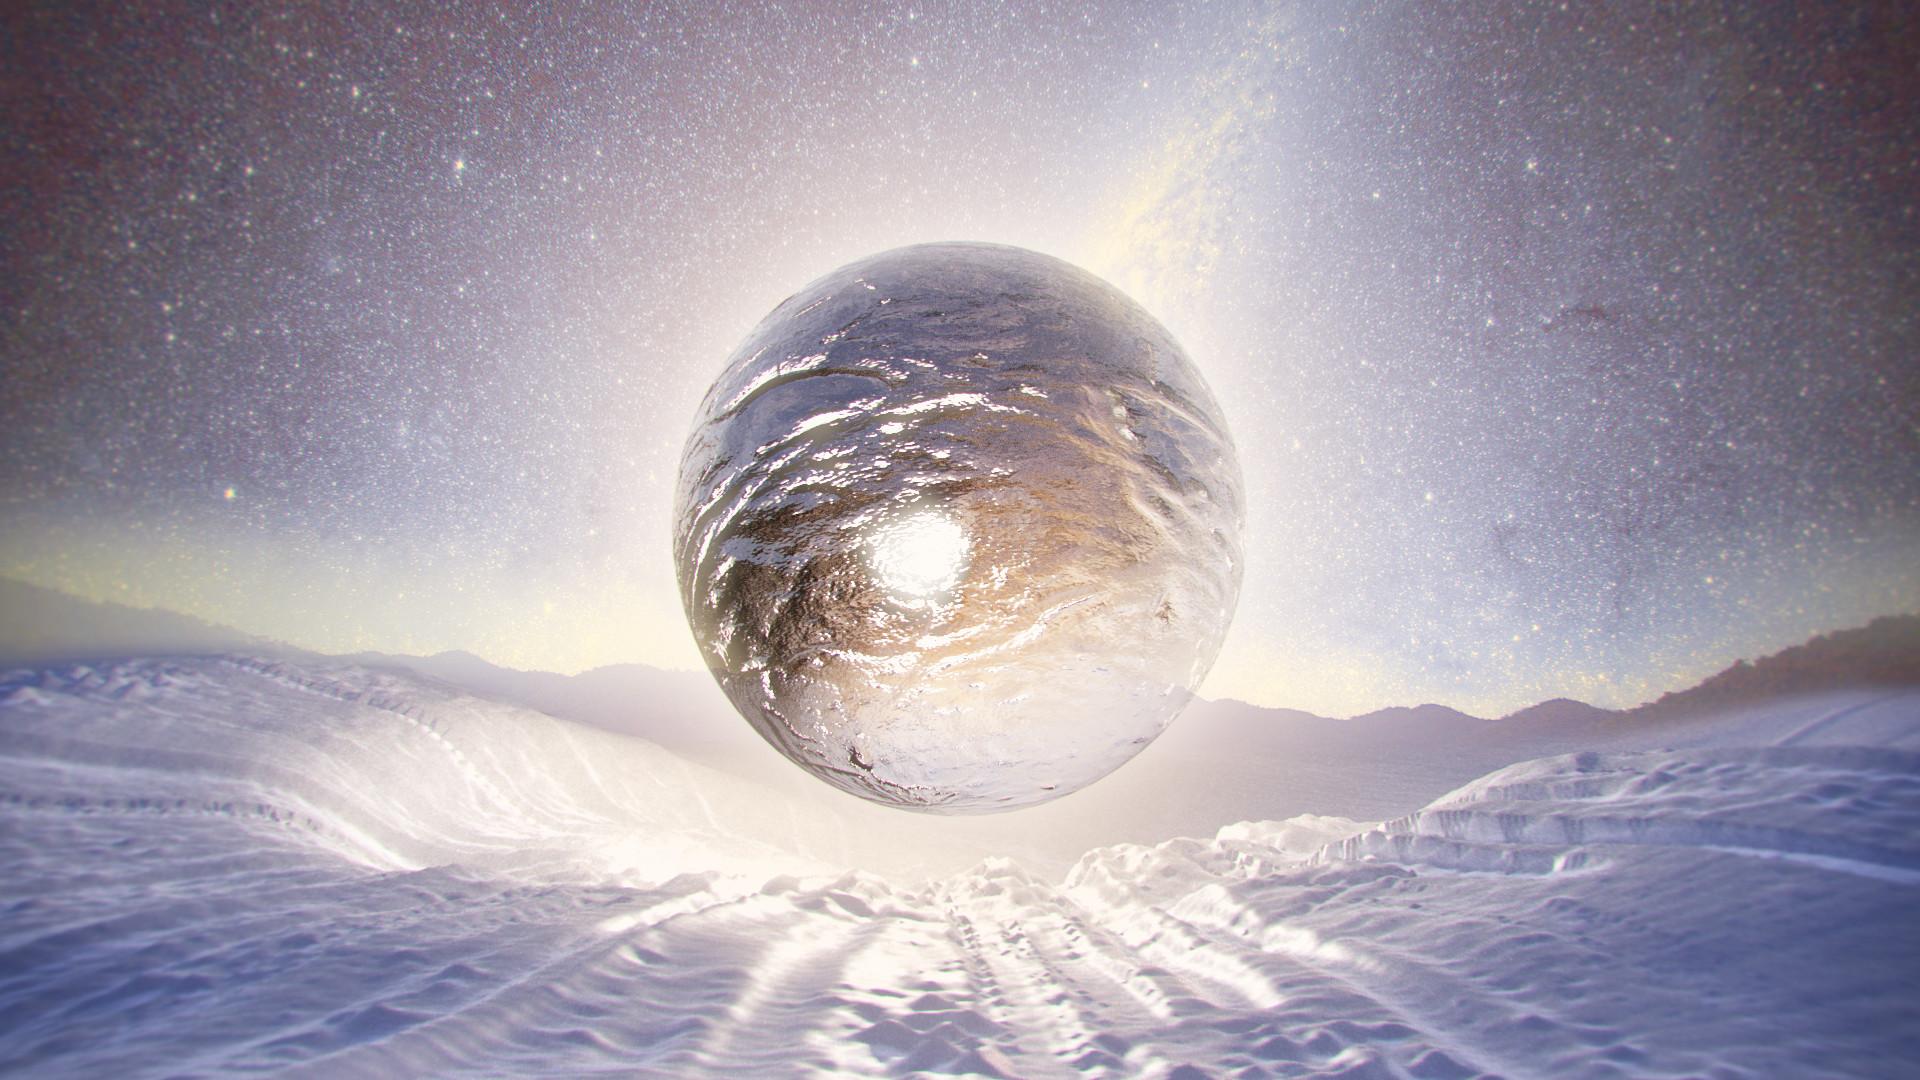 Andre mueller 2015 52 snowball